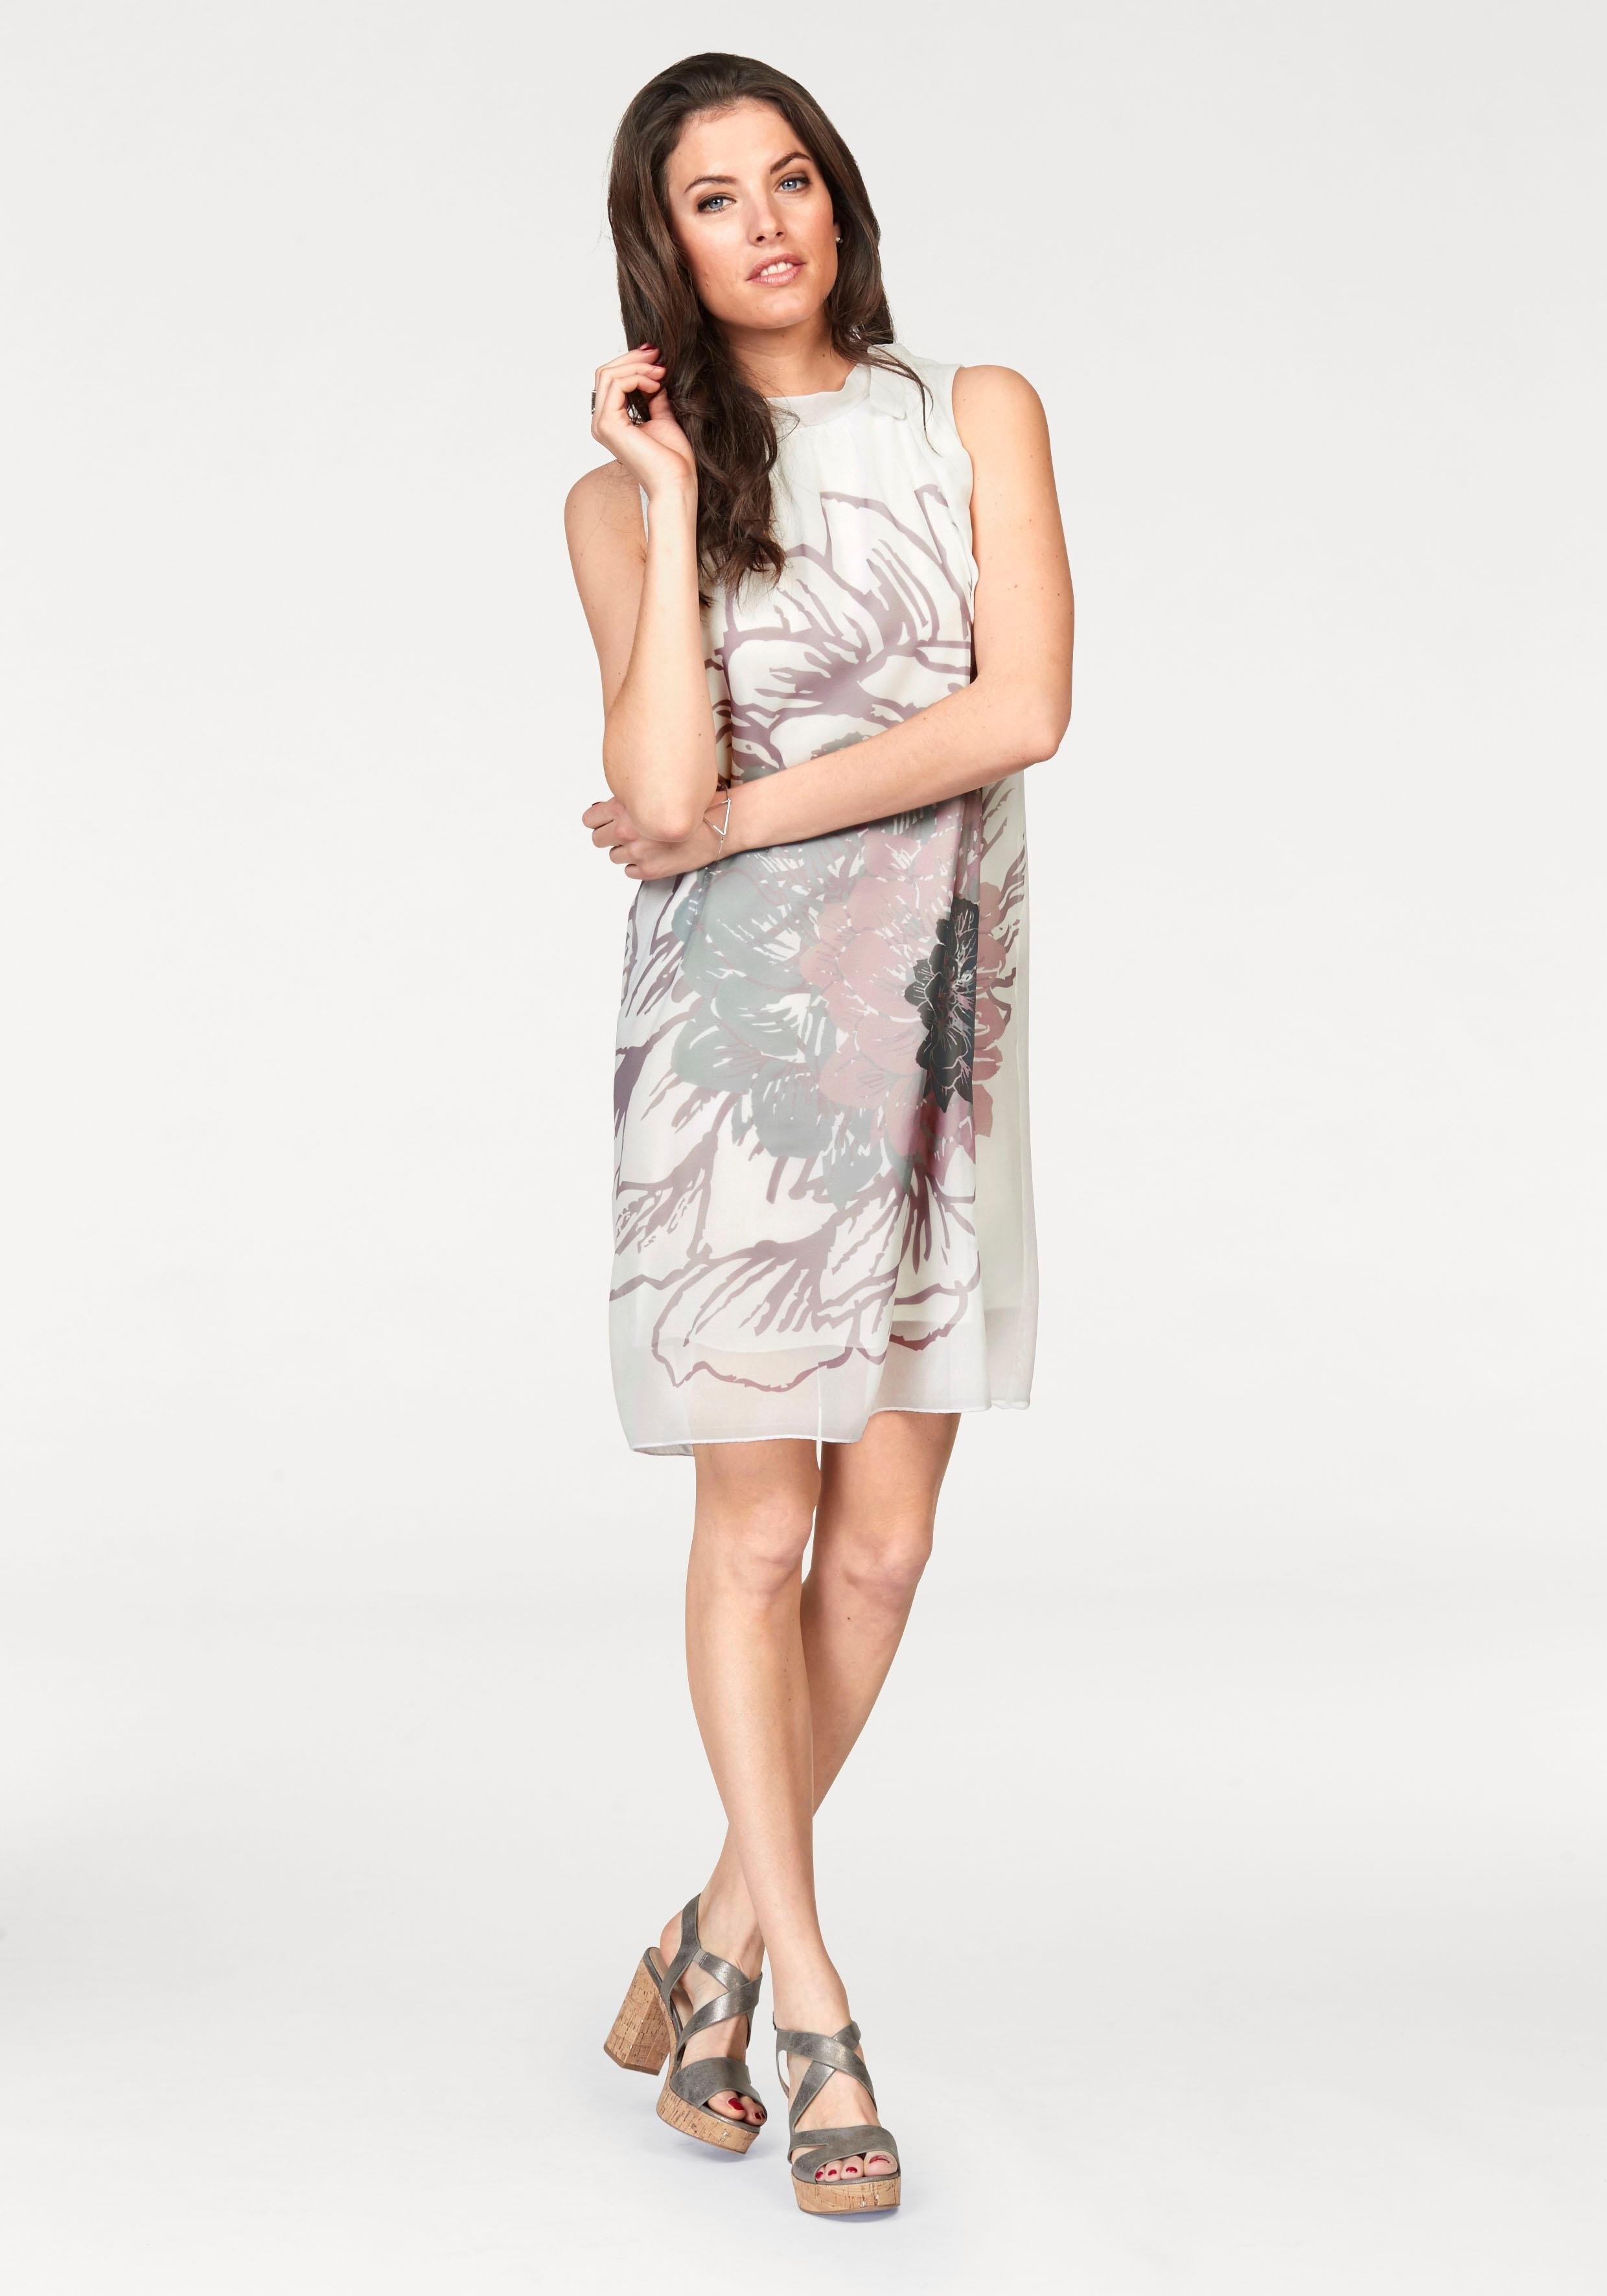 ef1a8aa590e78b VIVANCE A-lijn jurk koop je bij